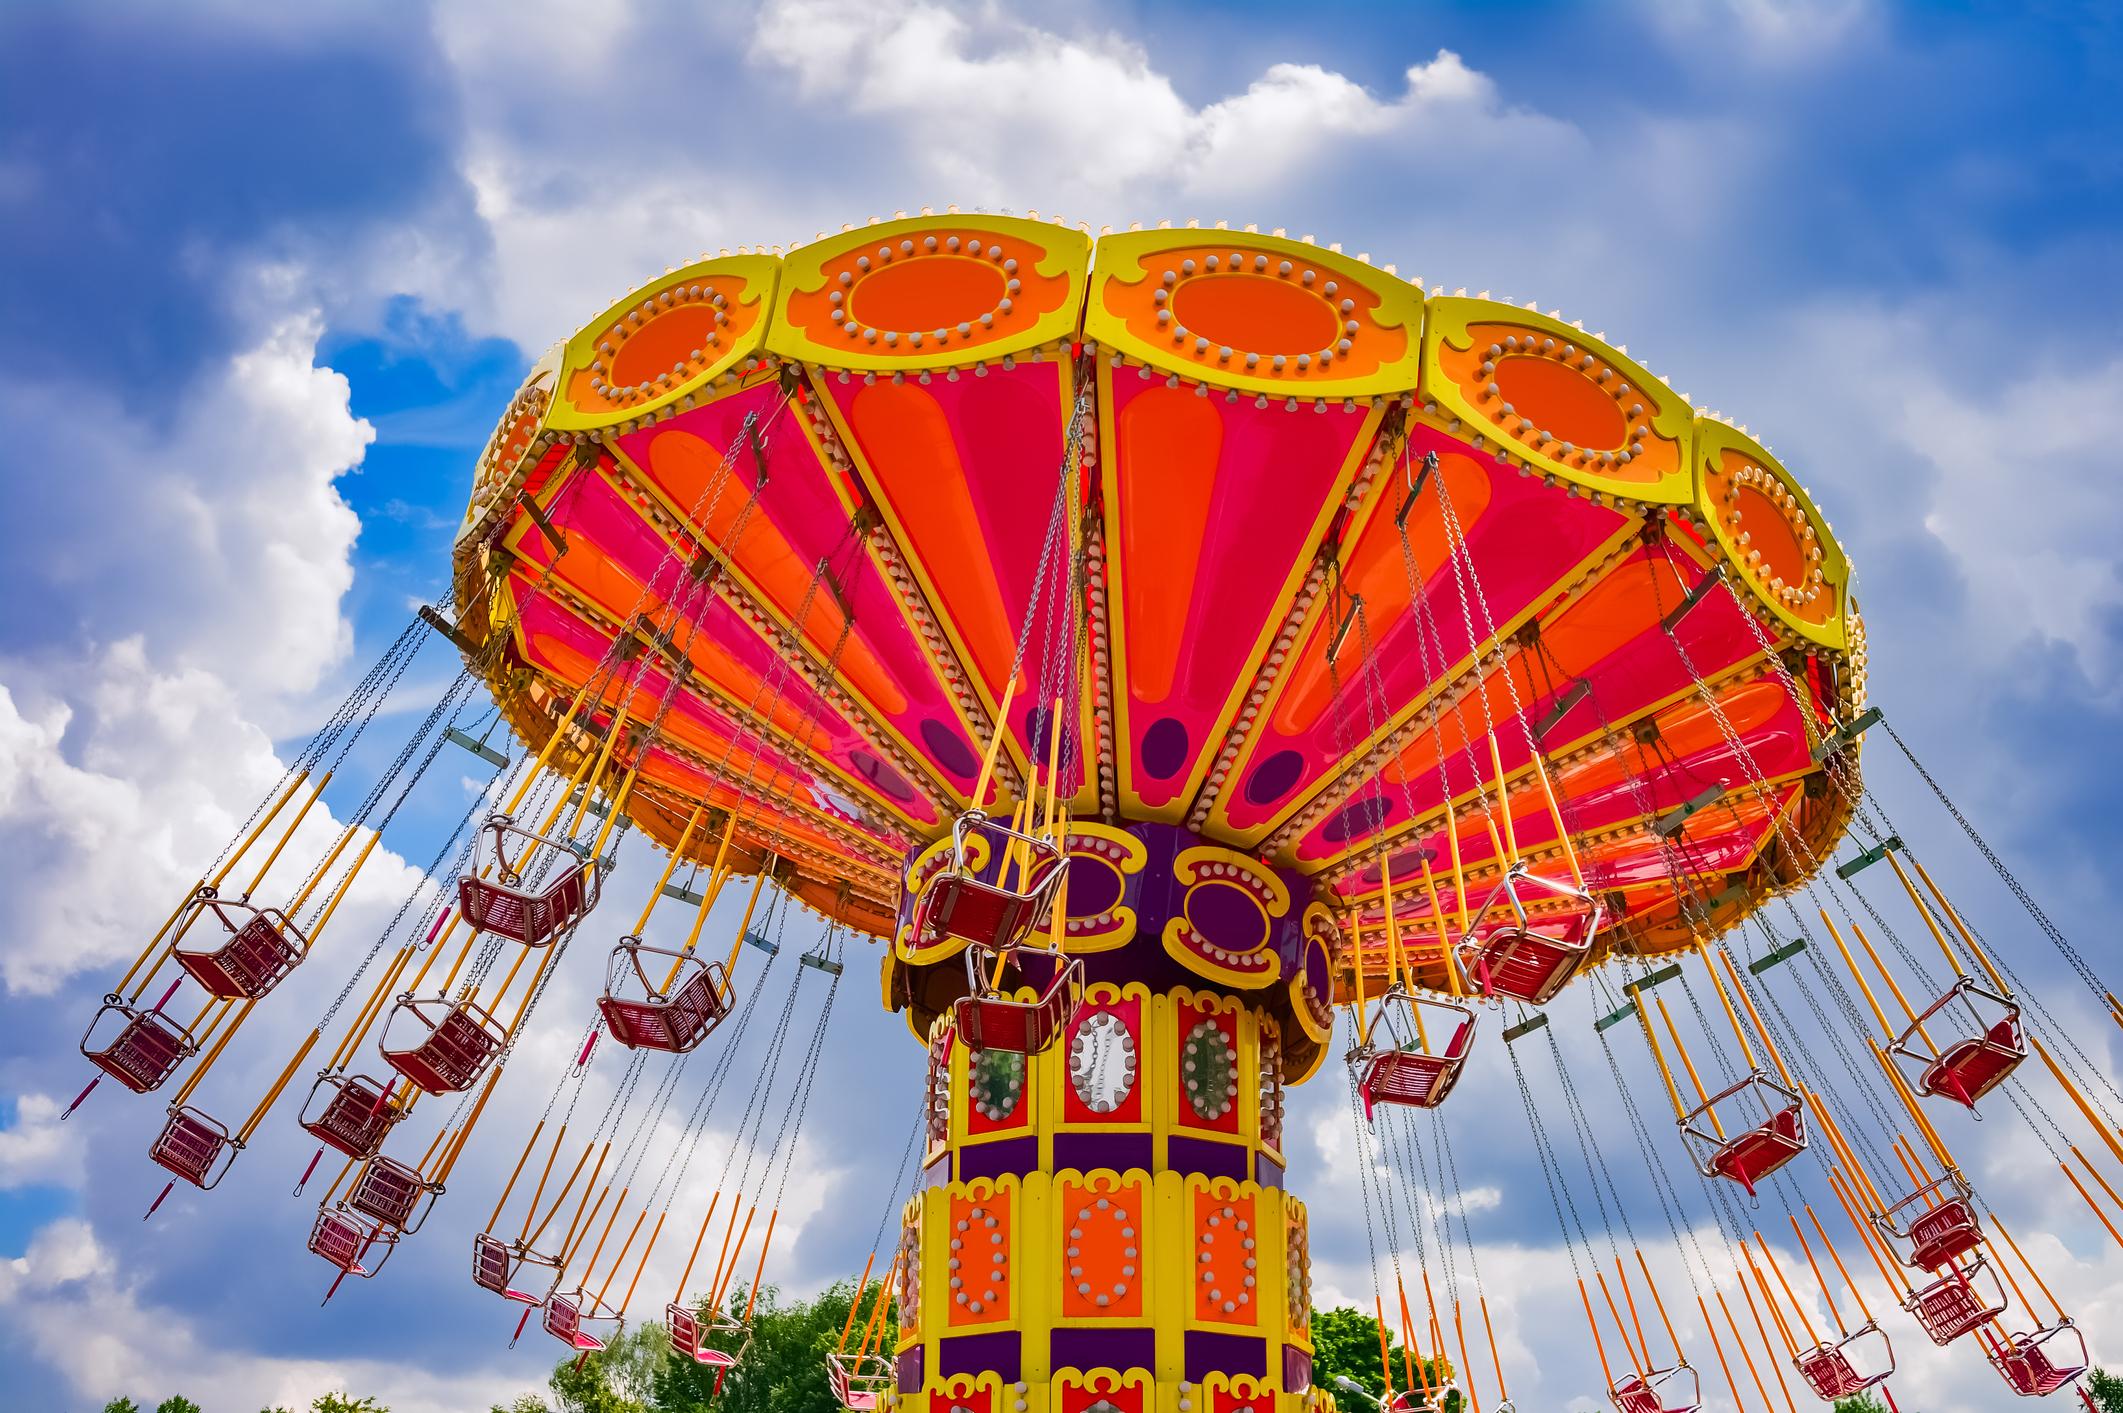 Ride at an amusement park.